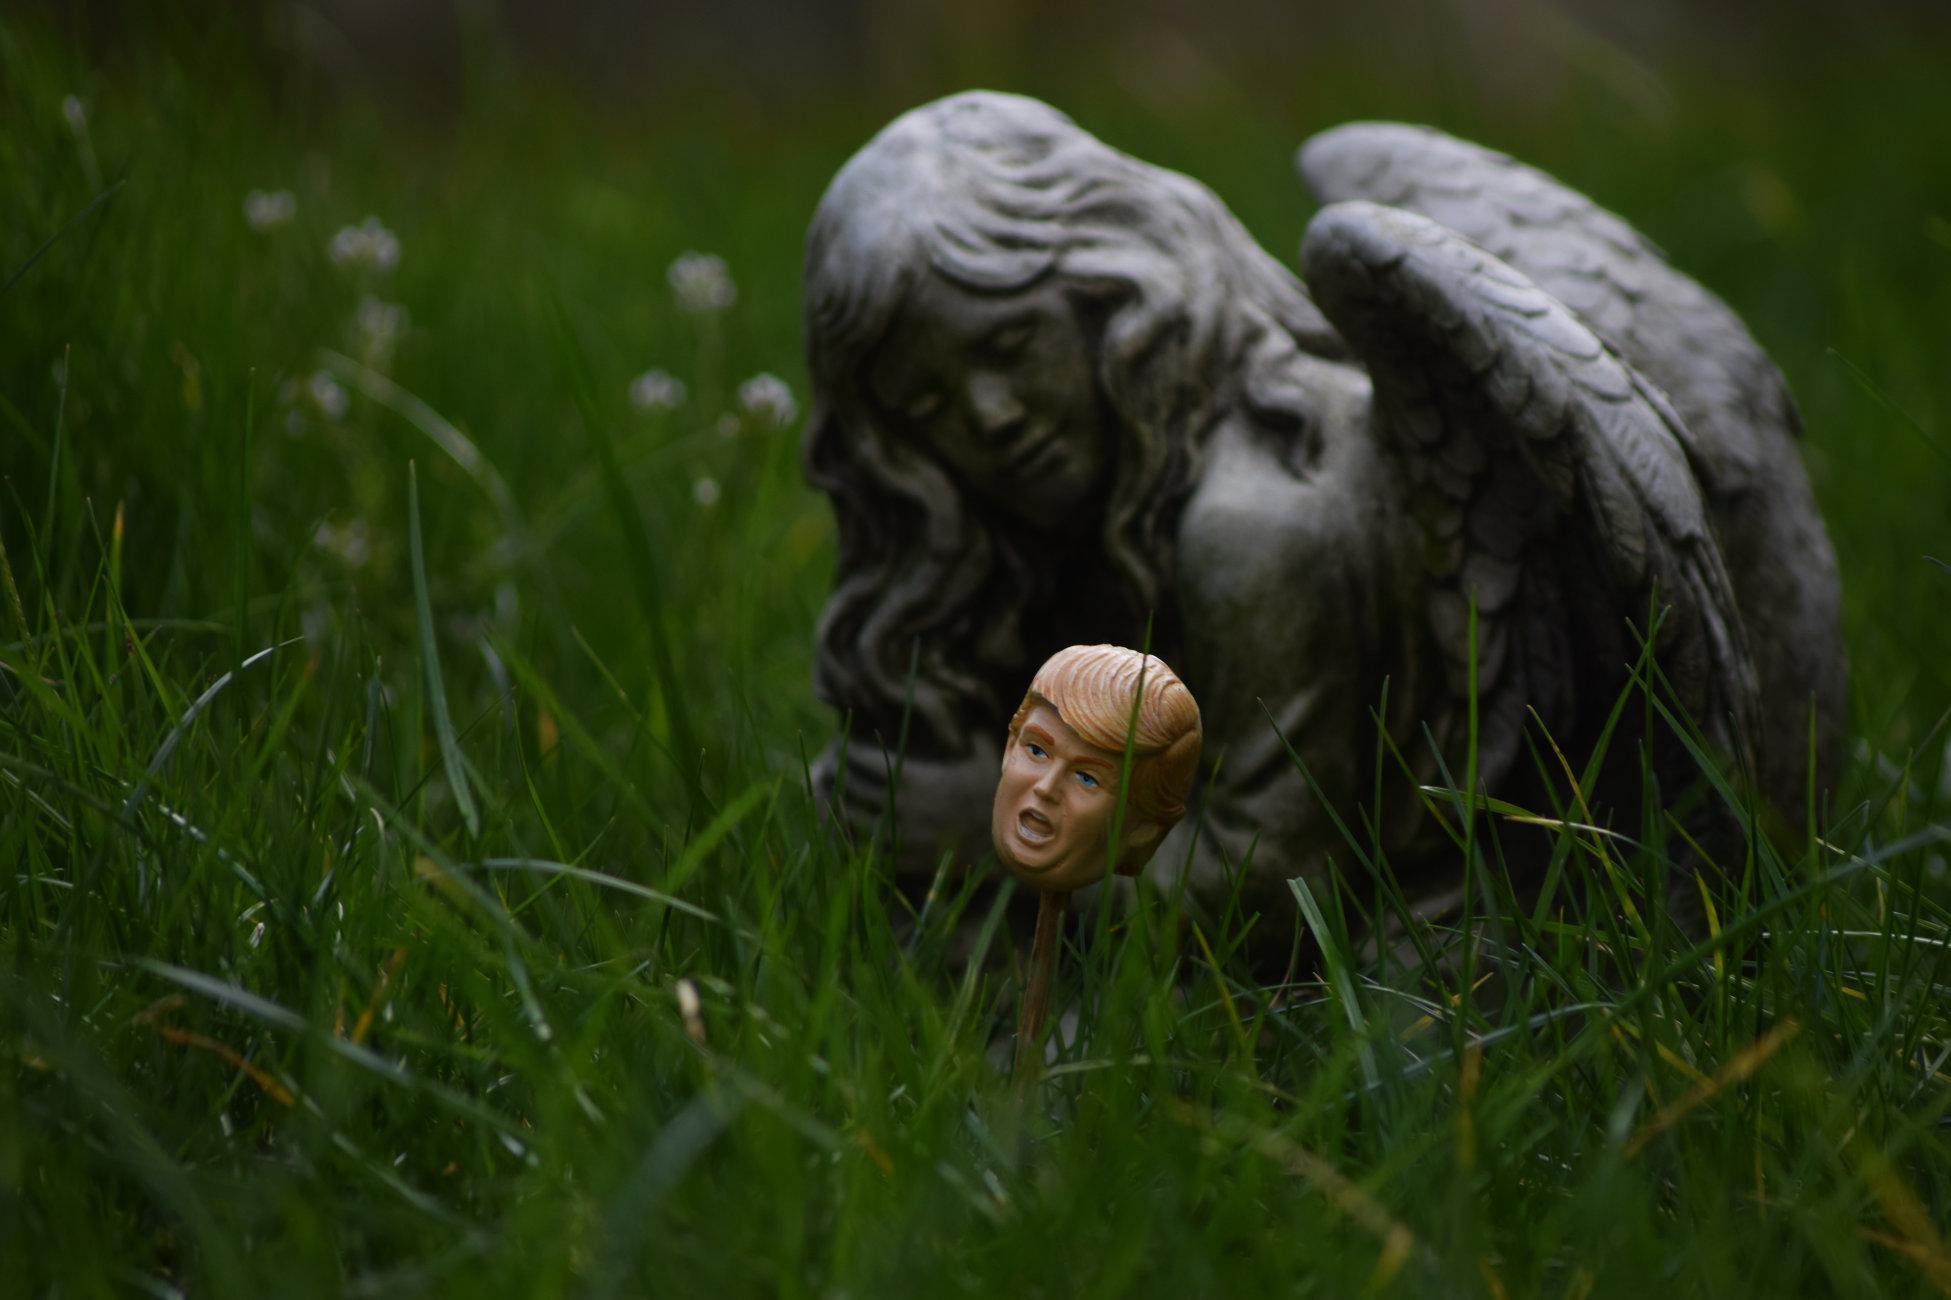 The unkempt lawn